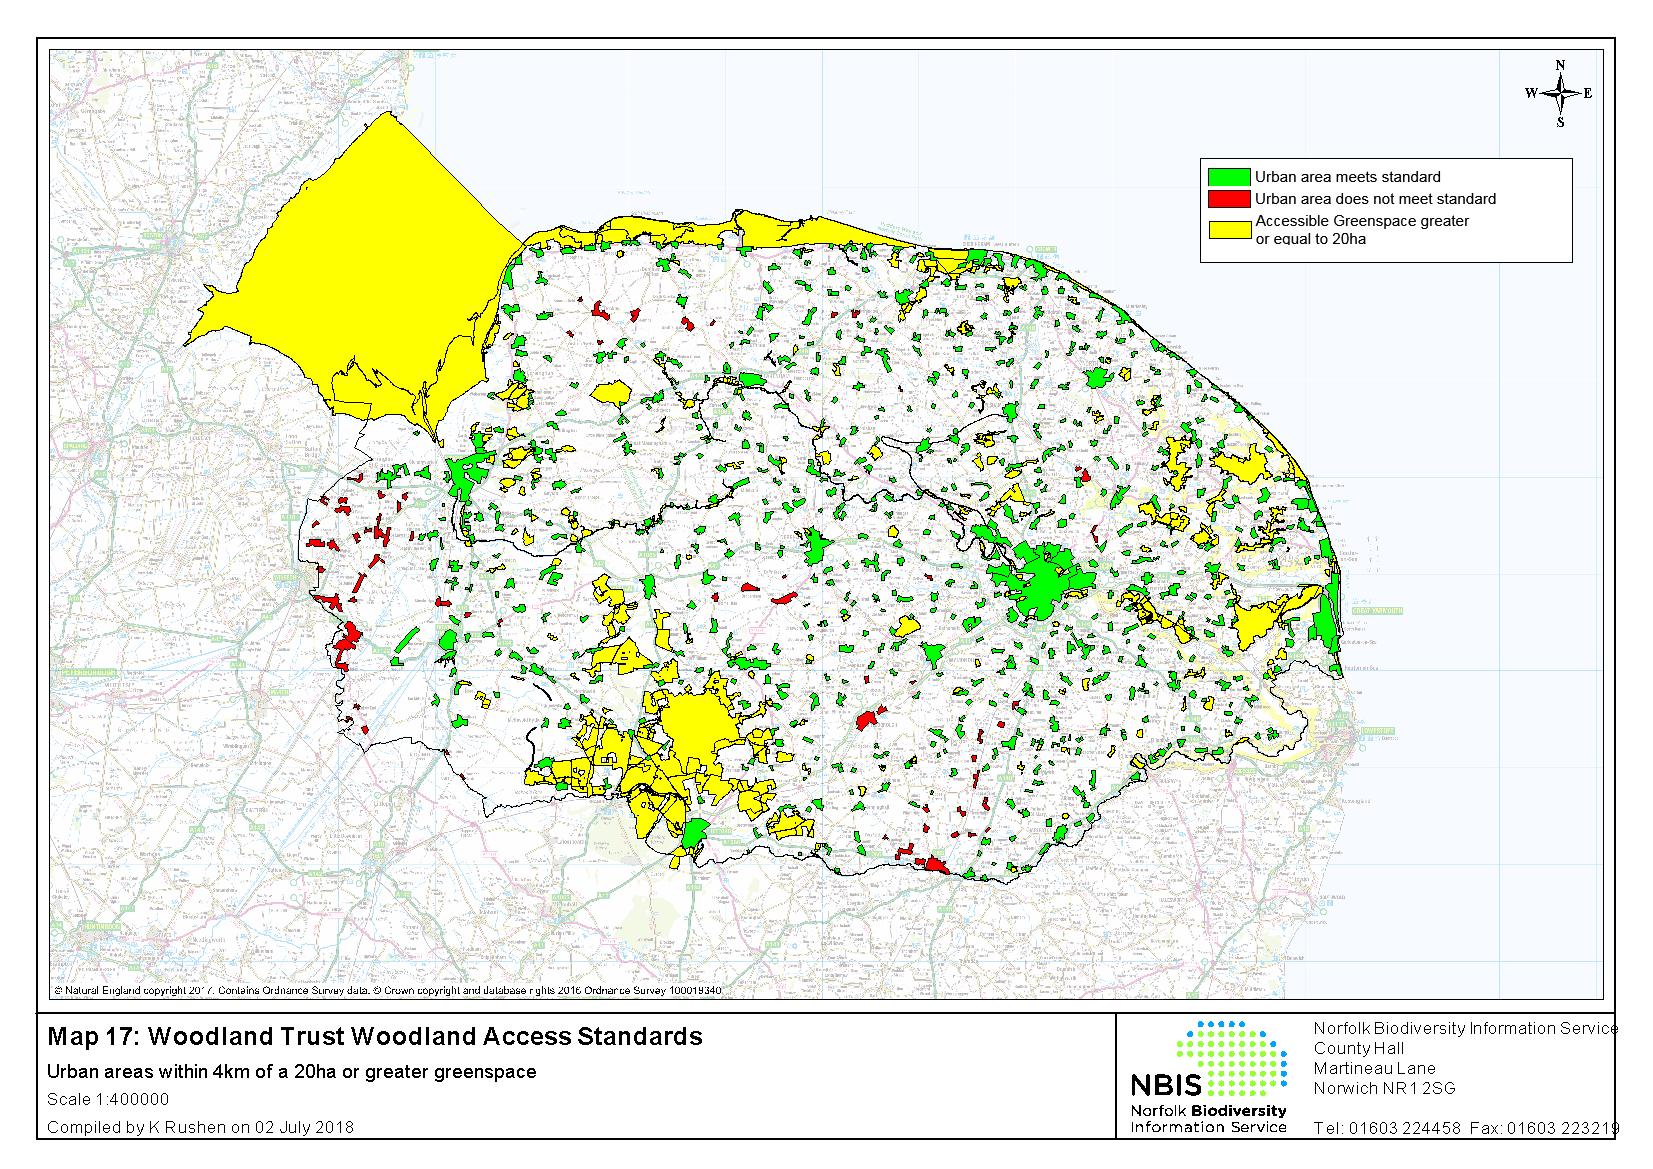 County Map Of England 2016.Publications Norfolk Biodiversity Partnership